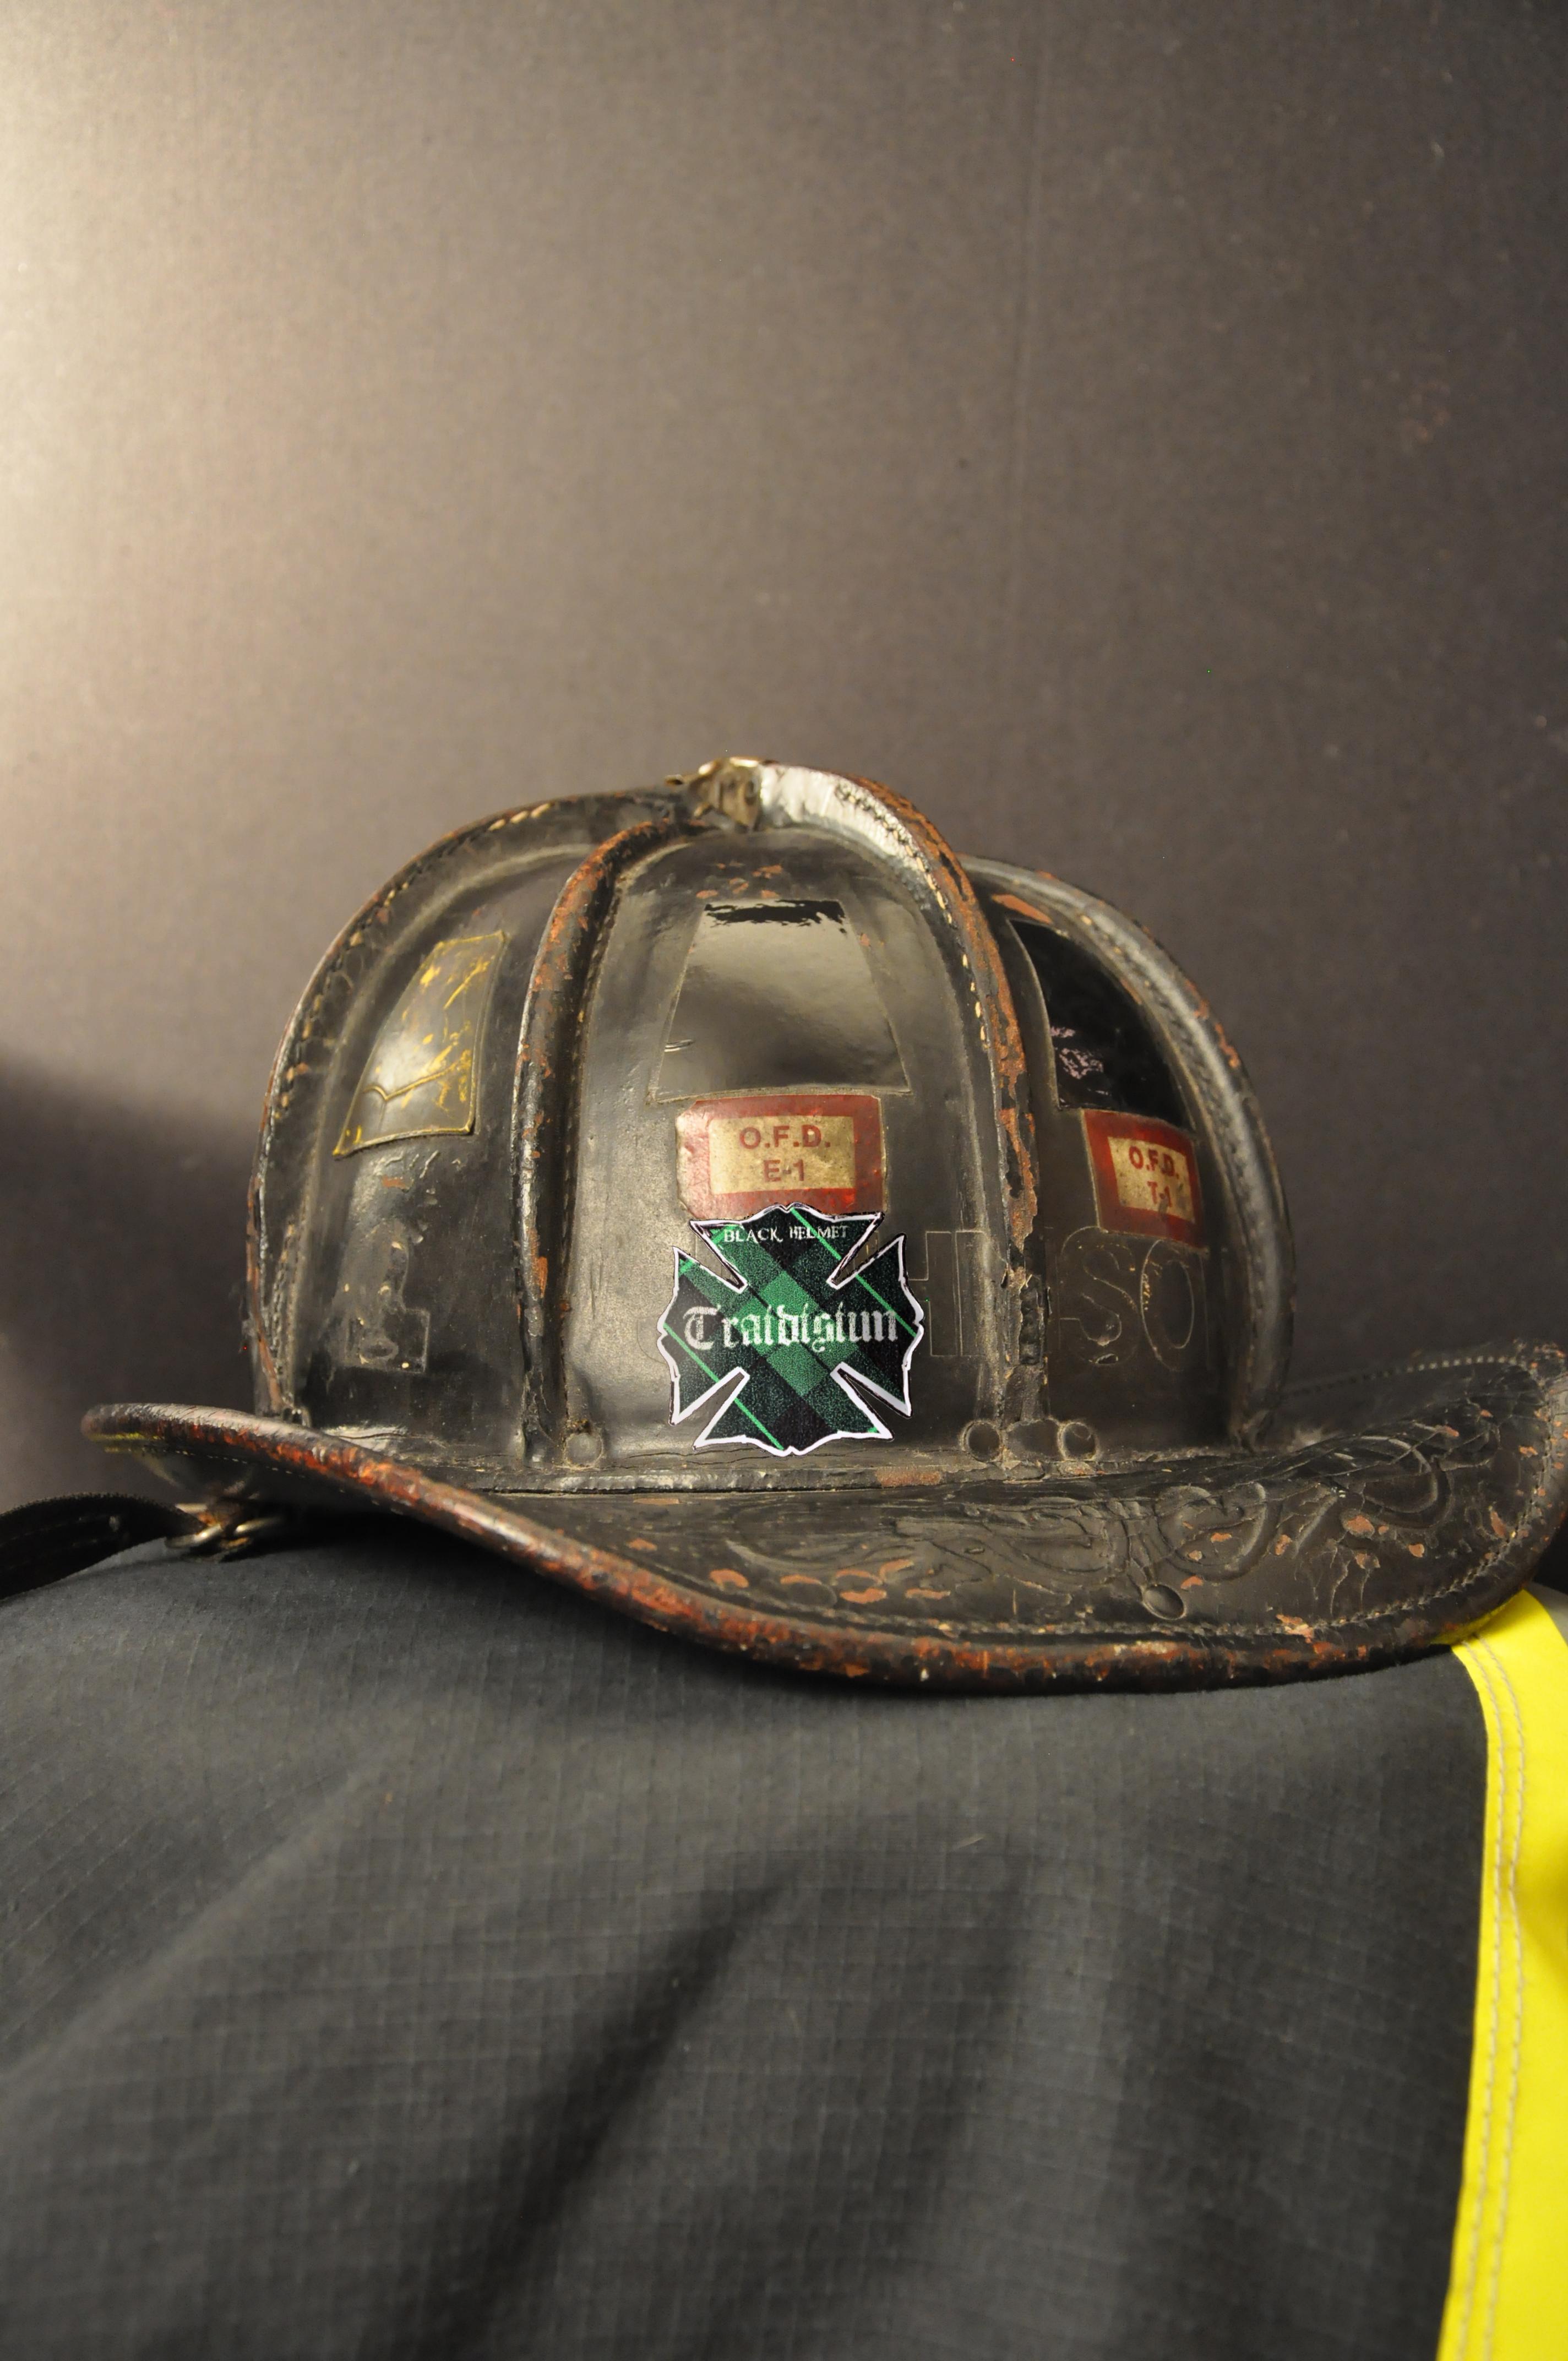 Traidisiun Plaid Fire Helmet Decal Black Helmet Firefighter - Fire helmet decals